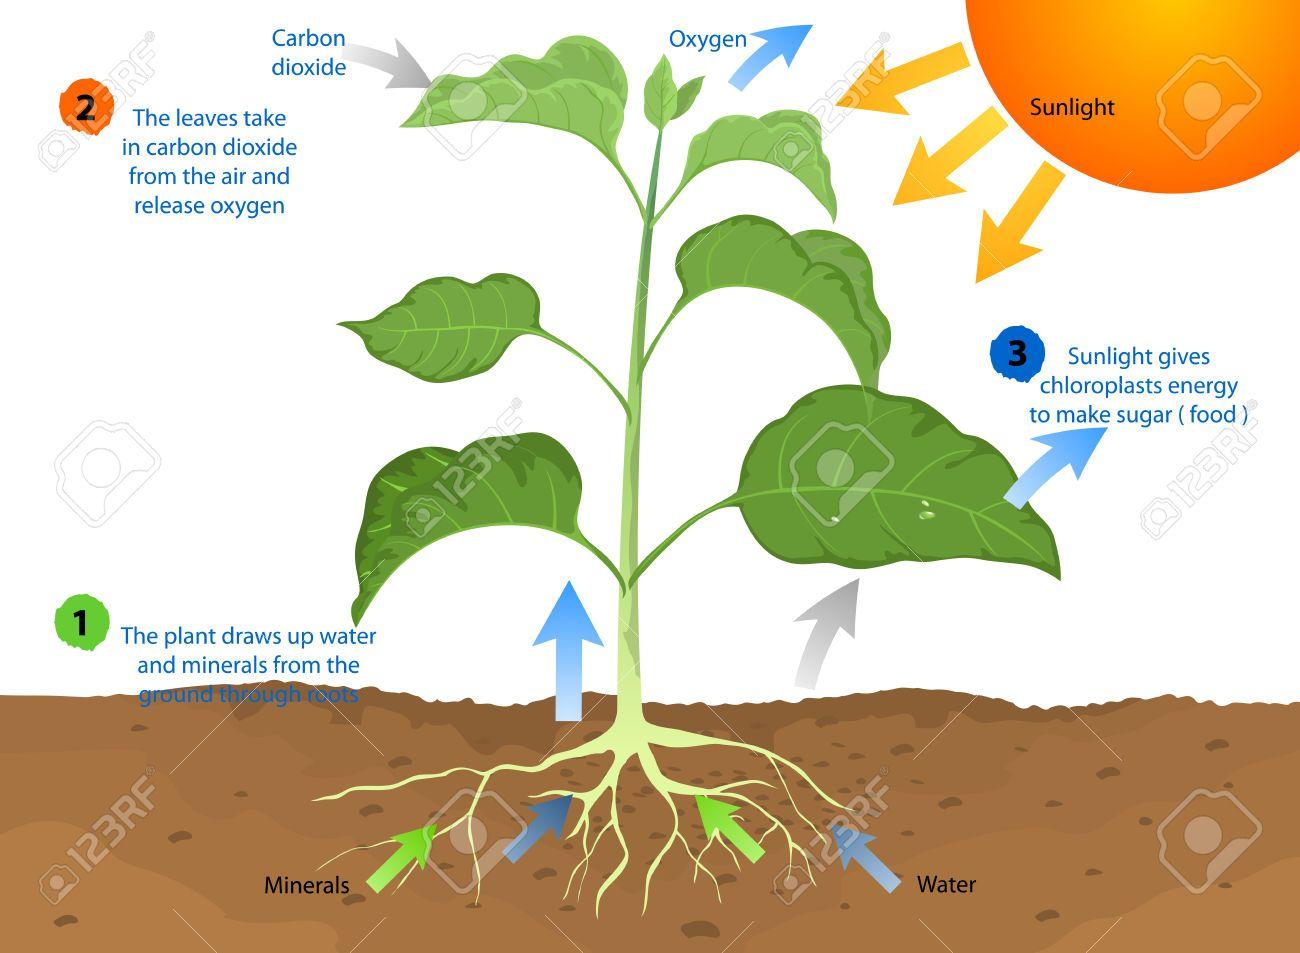 Imagenes De La Fotosintesis Photosynthesis Photosynthesis Projects Photosynthesis And Cellular Respiration